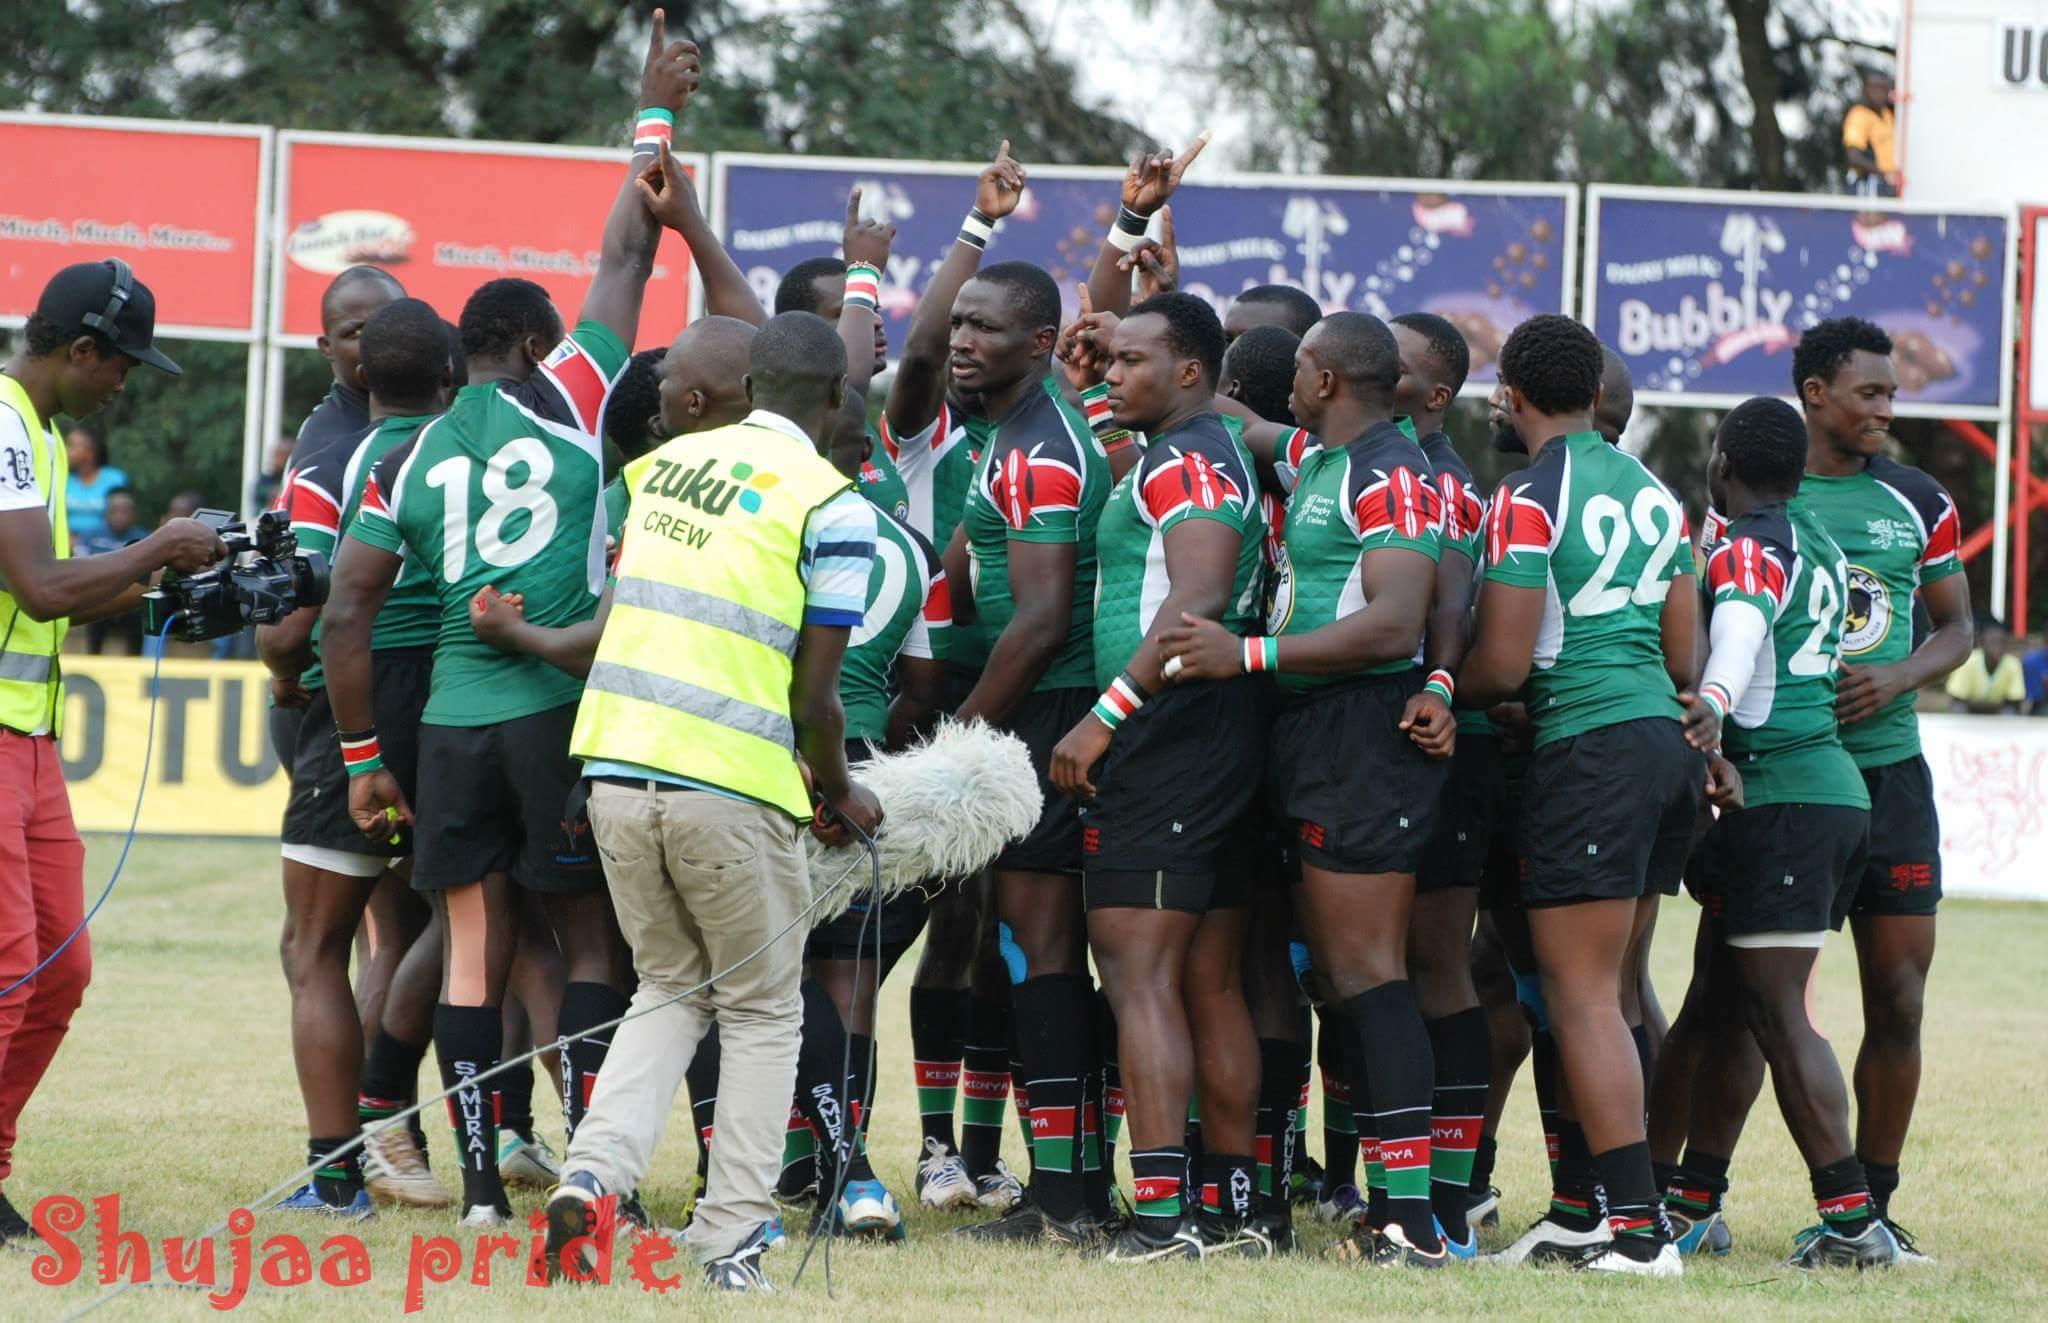 KRU CEO touches on Kenya fifteens sponsorship